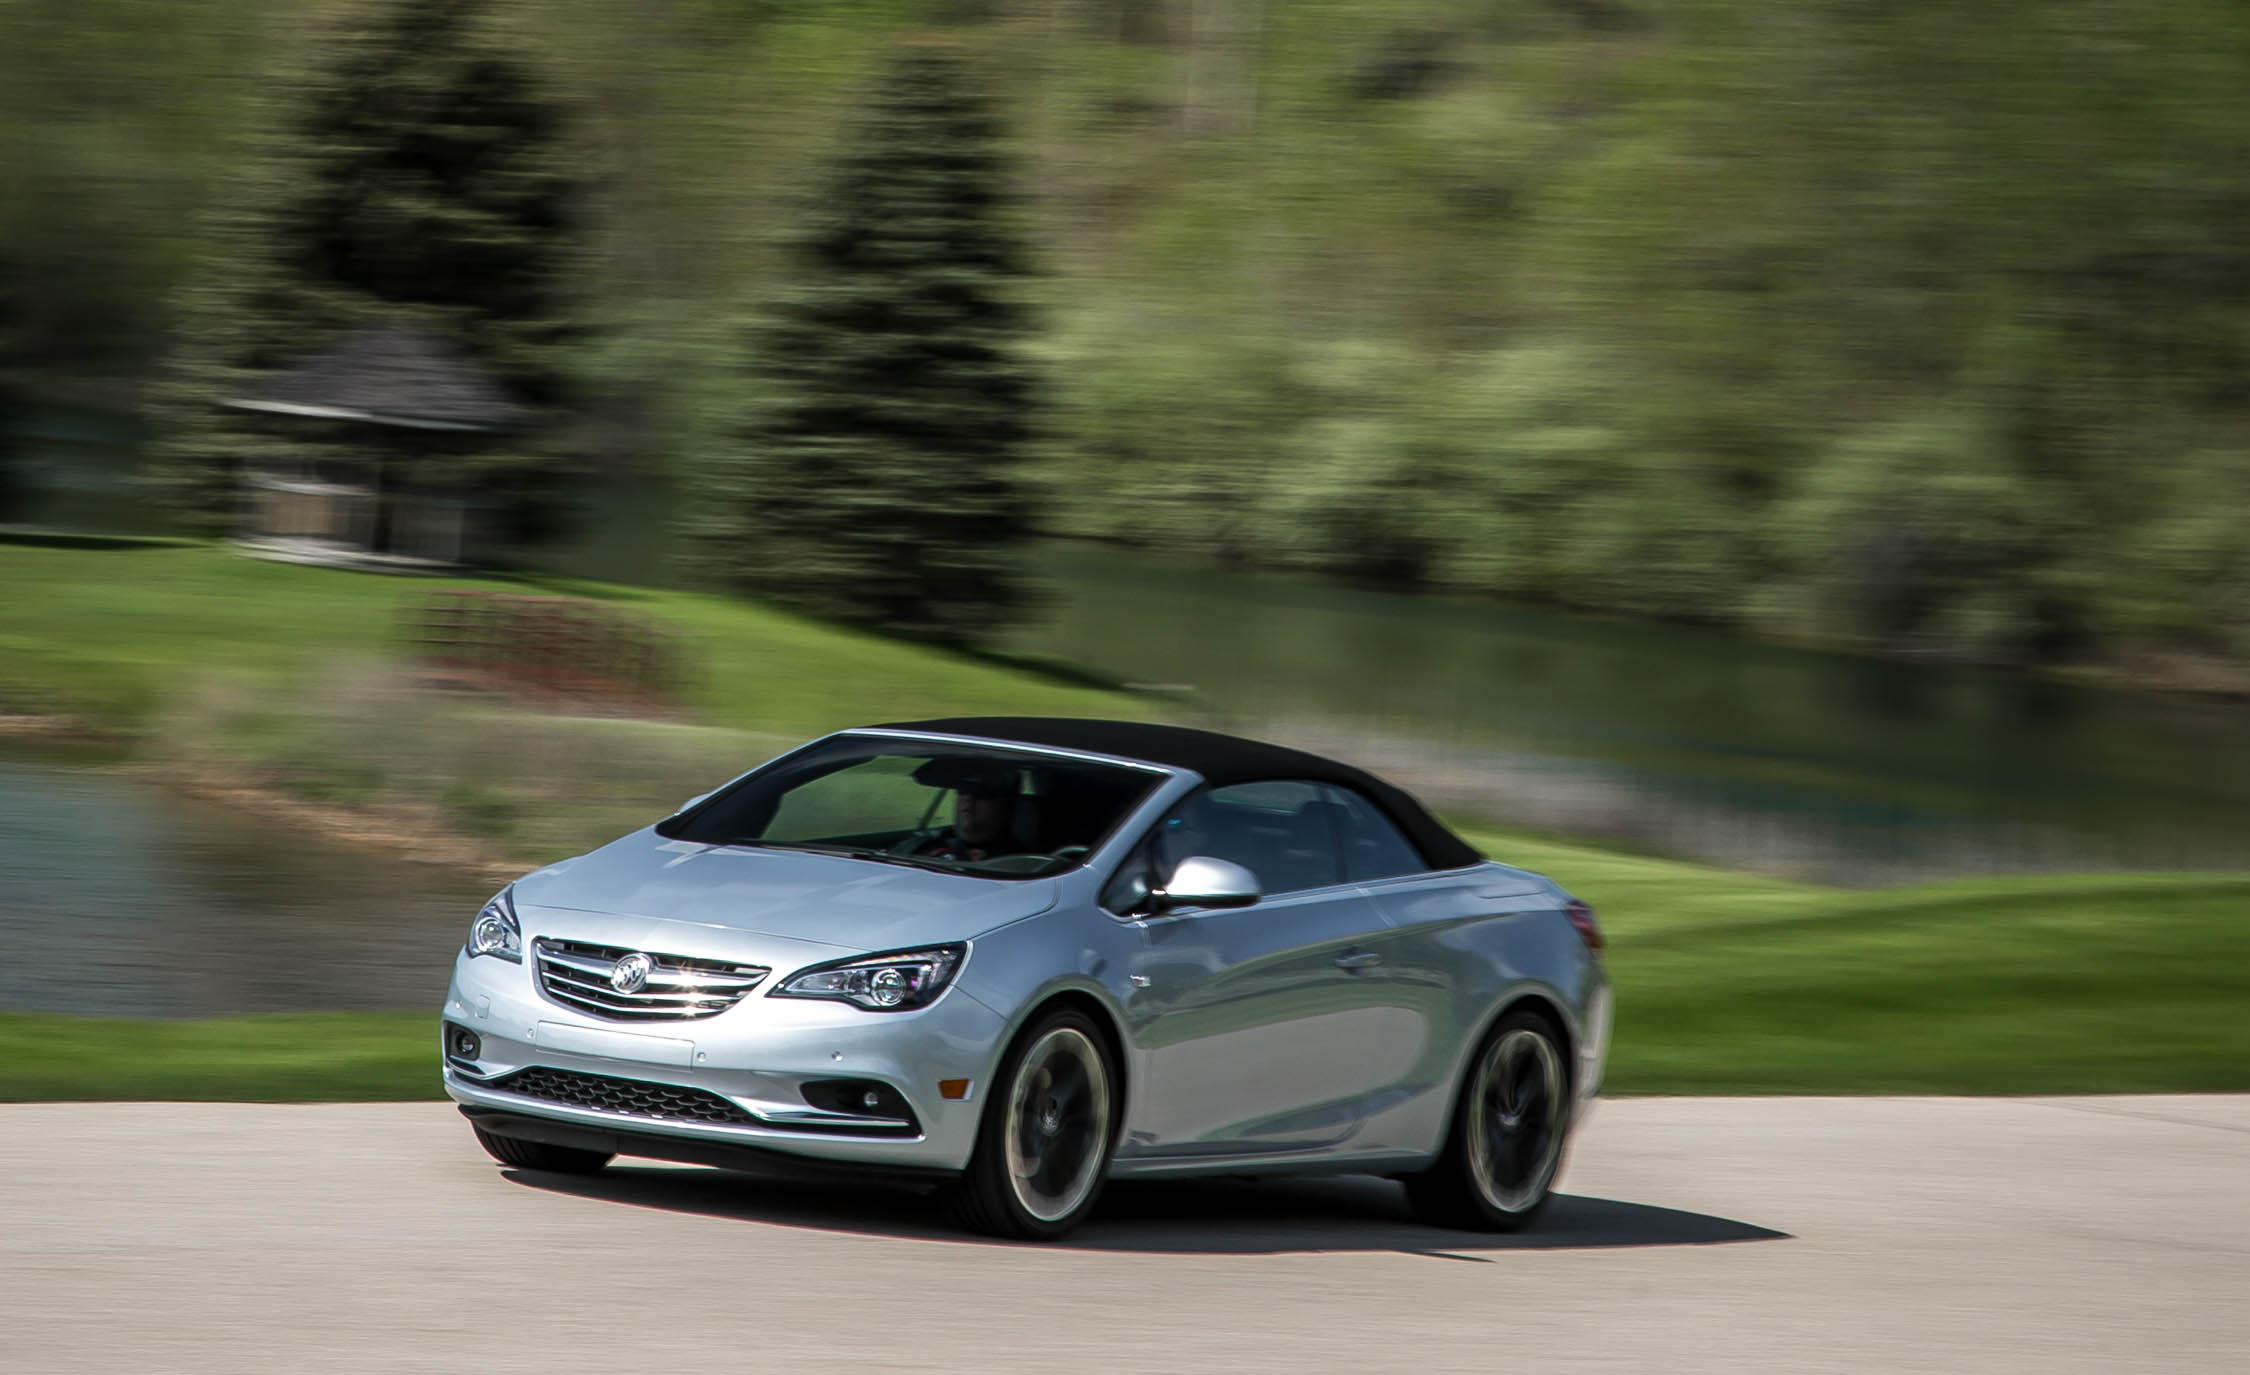 2016 Buick Cascada Premium (Photo 15 of 24)